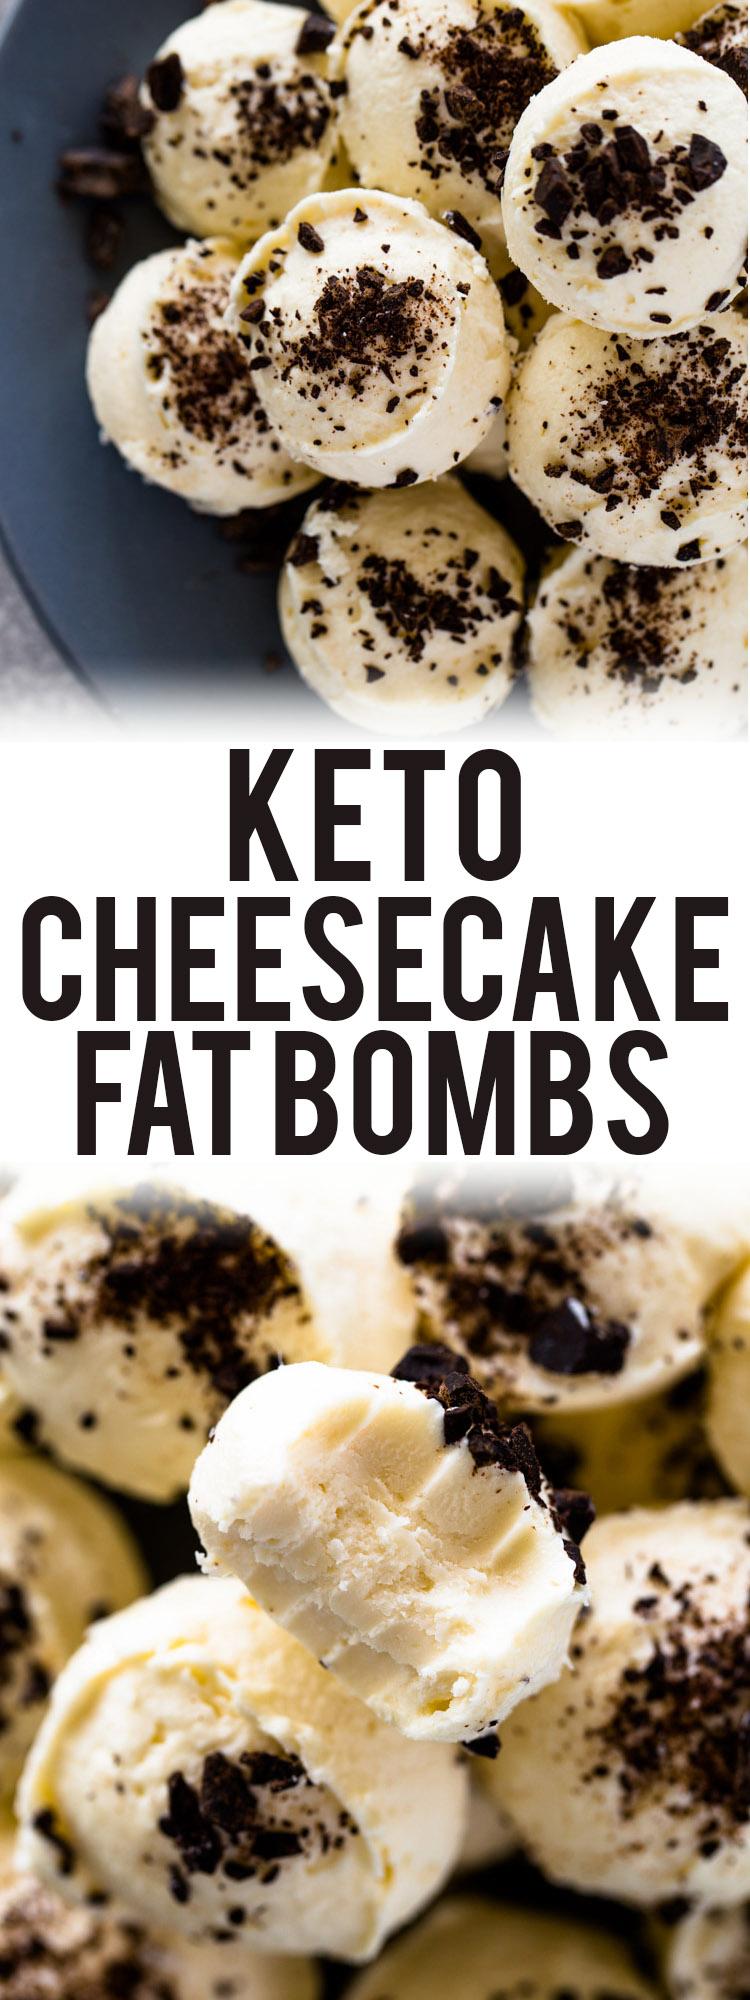 Keto Cheesecake Fat Bombs